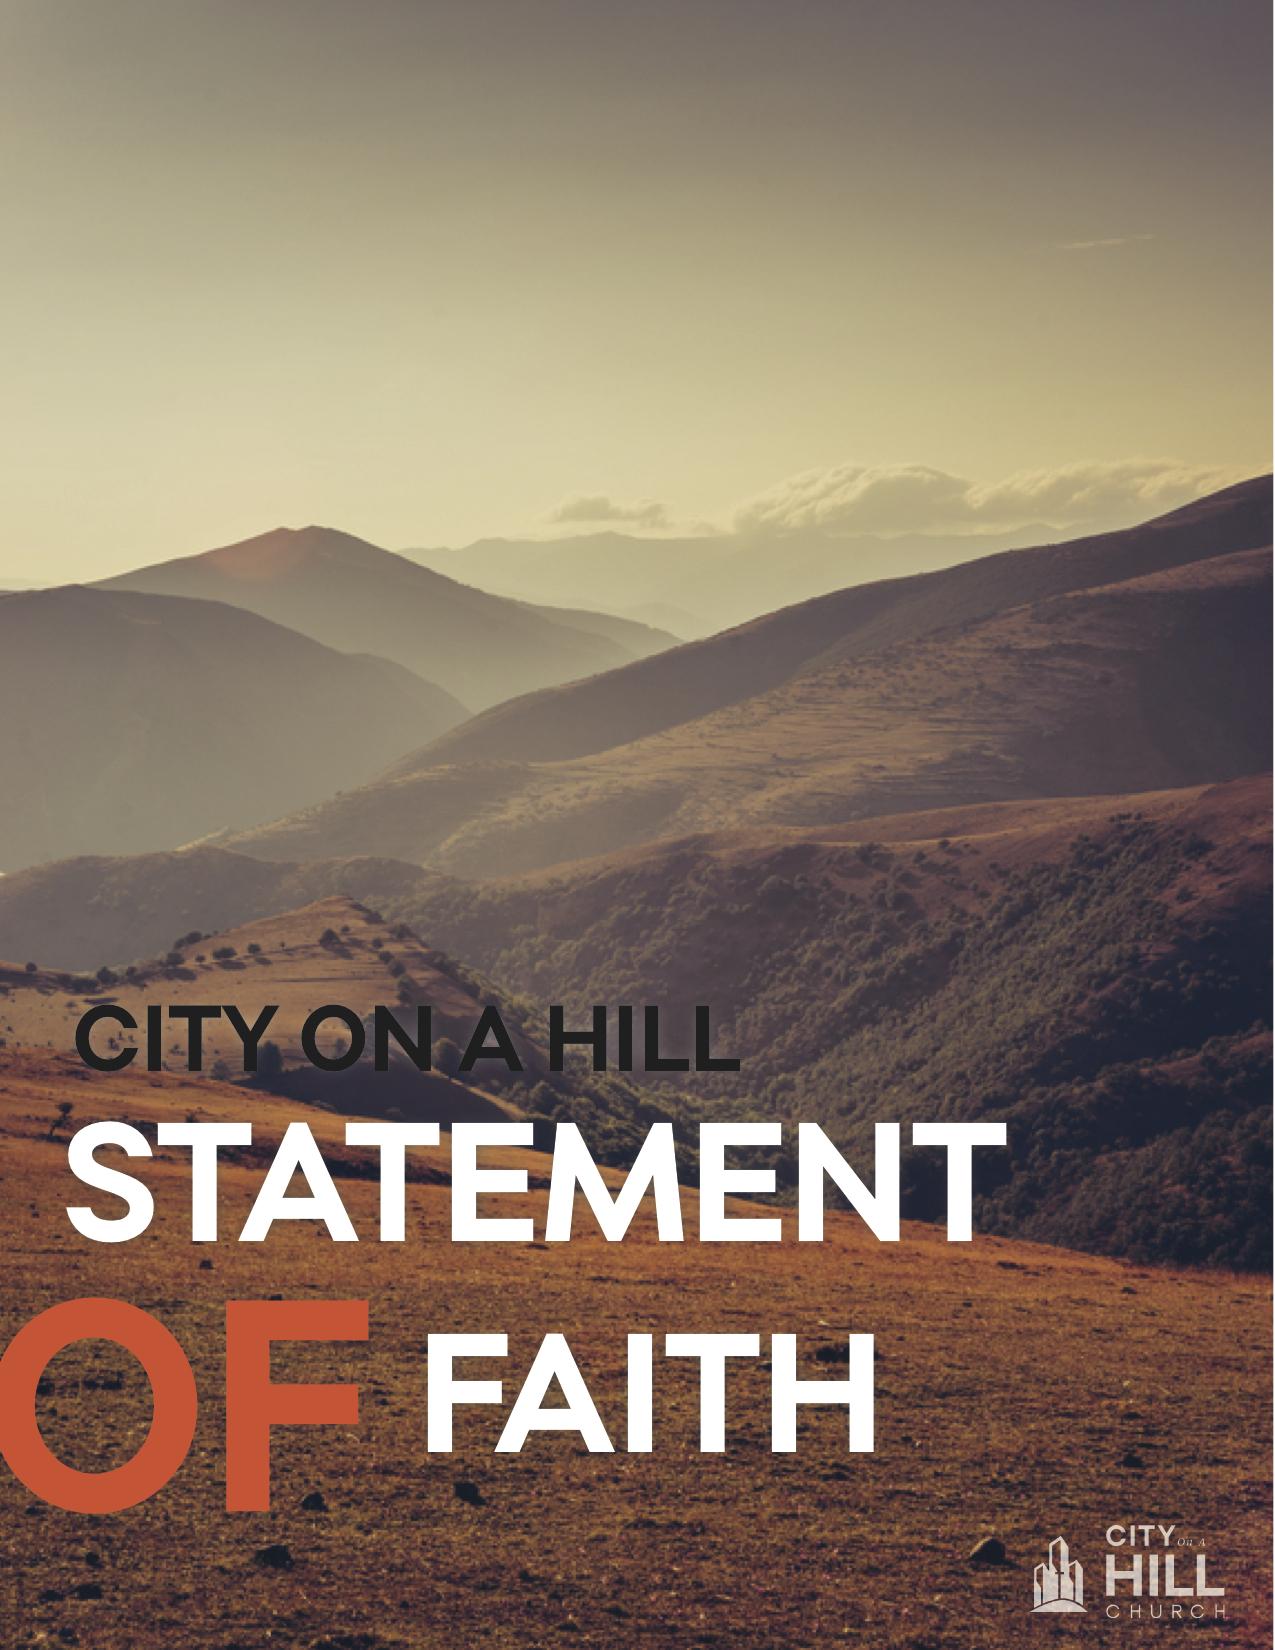 CoaH_FaithStatement.jpg